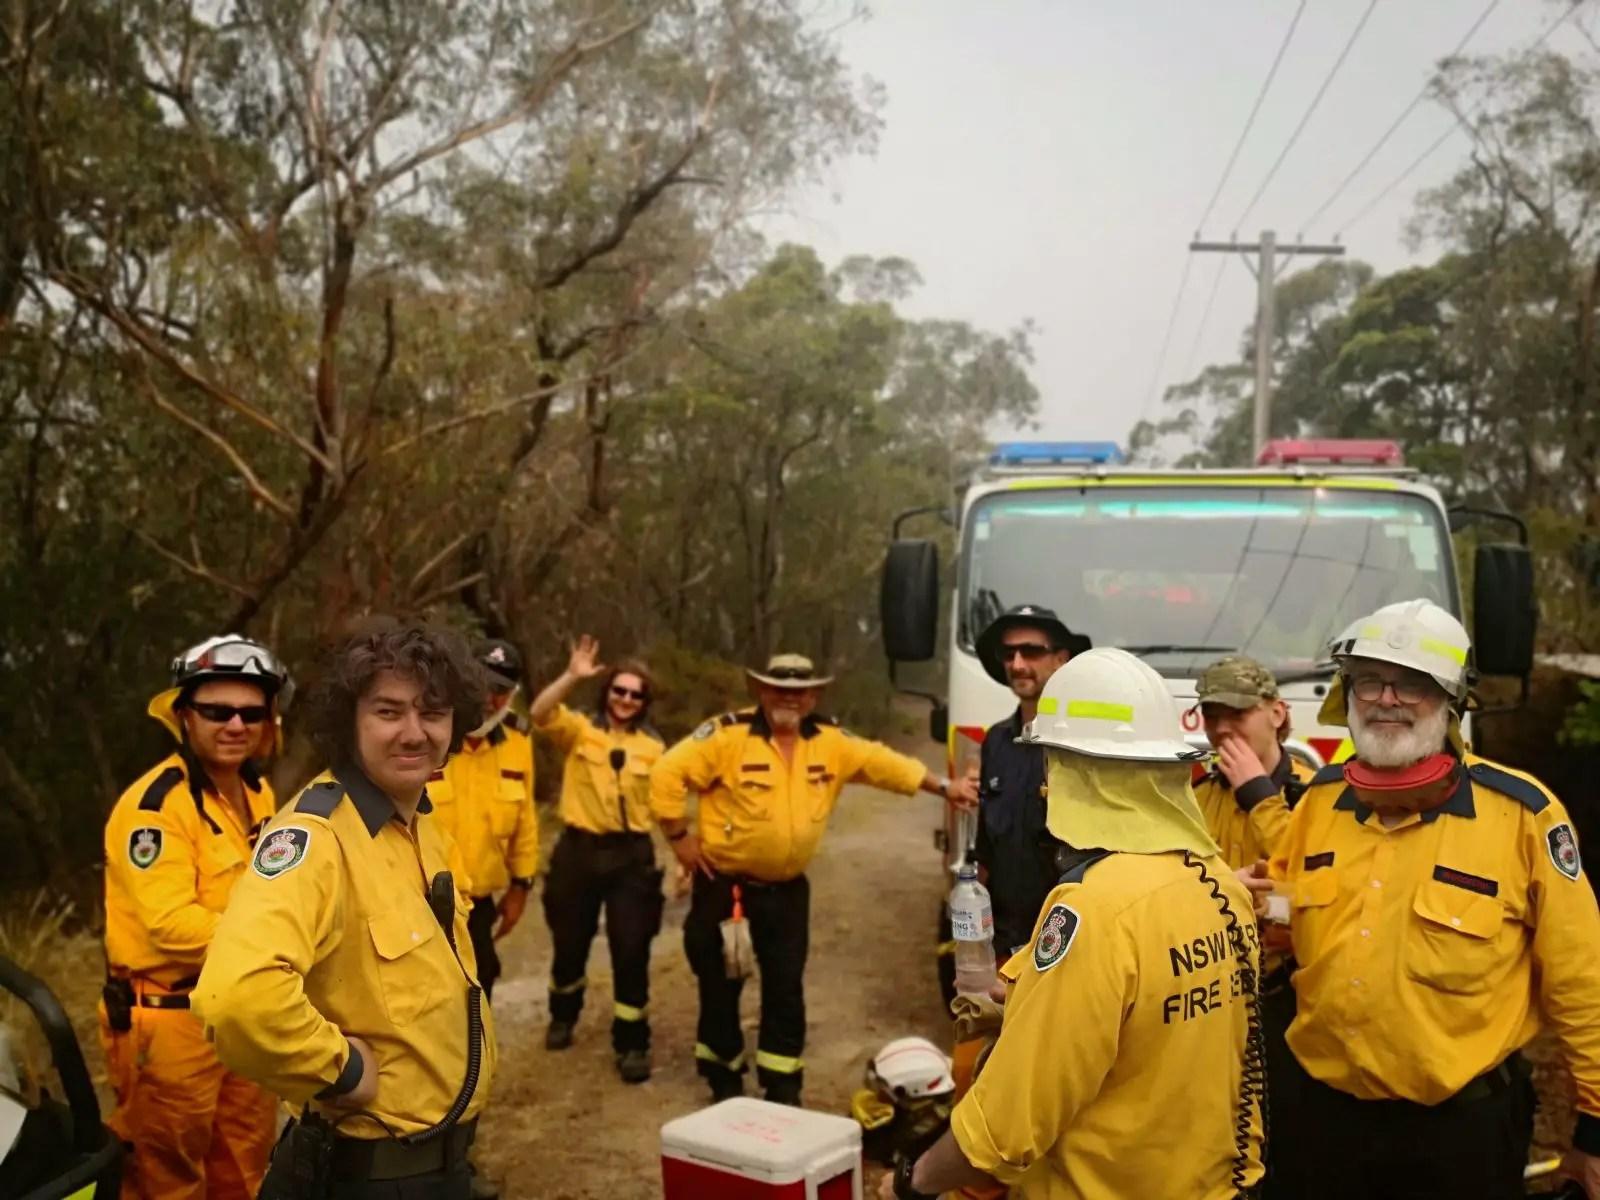 The Australian NSW bushfires on film - The crew on break